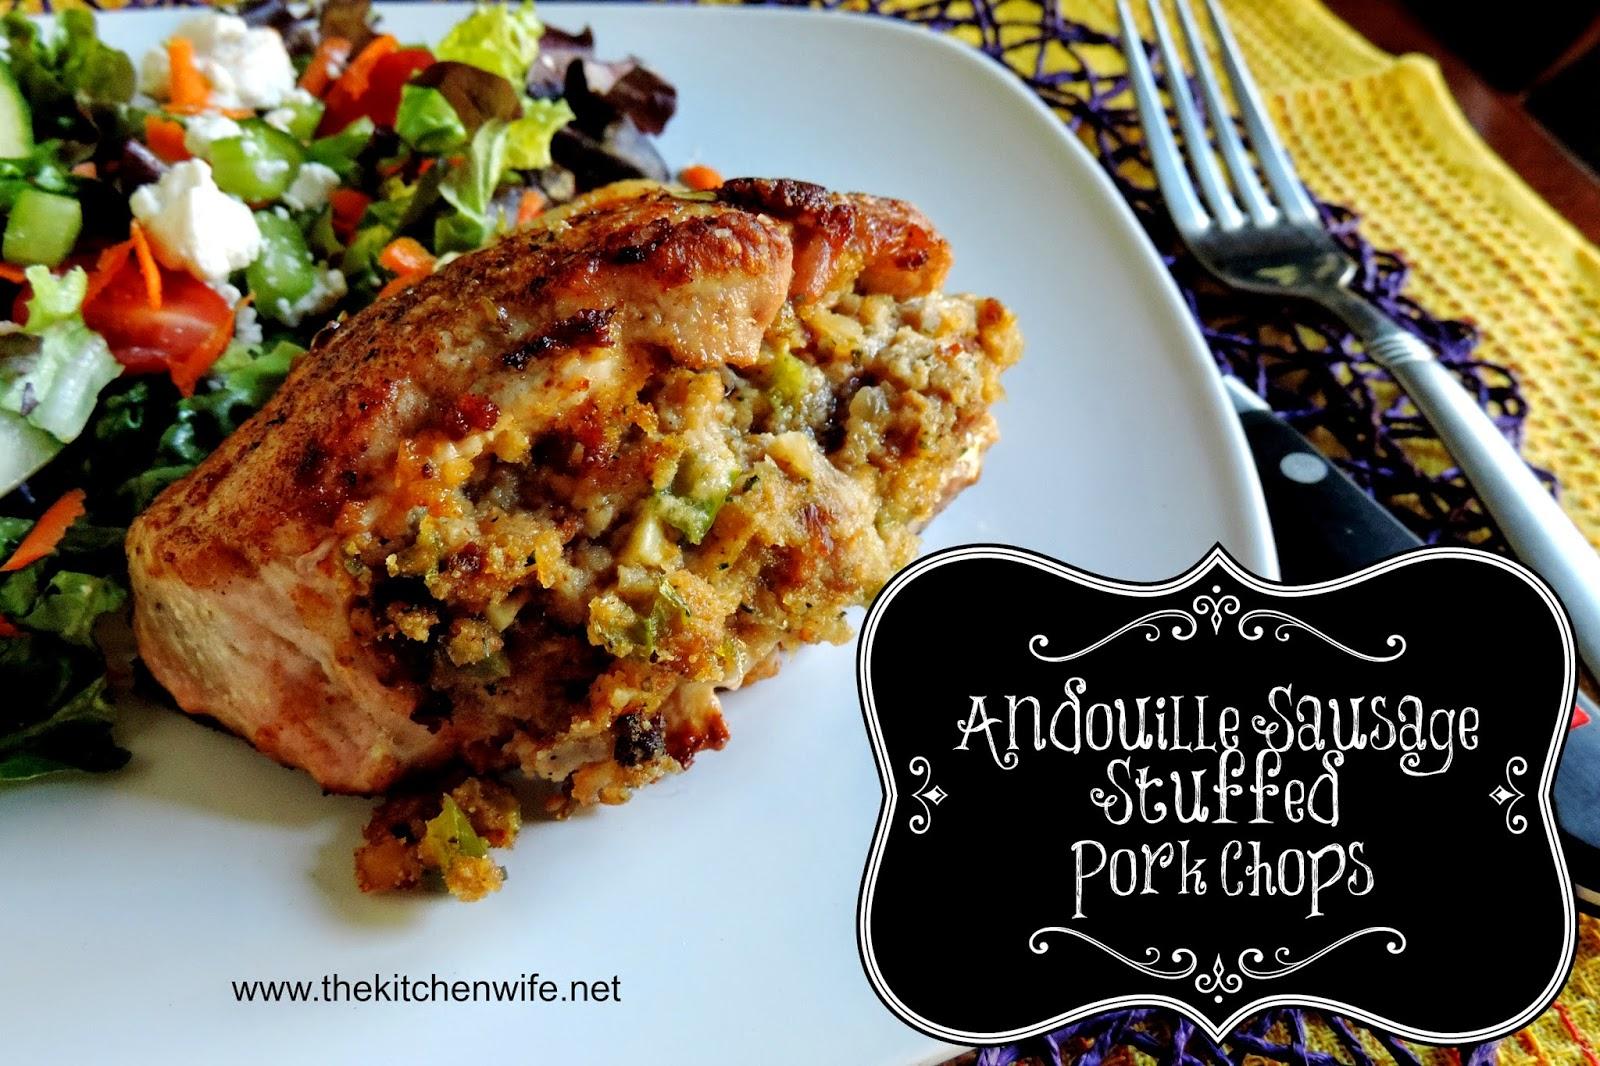 Sausage stuffed pork chop recipes